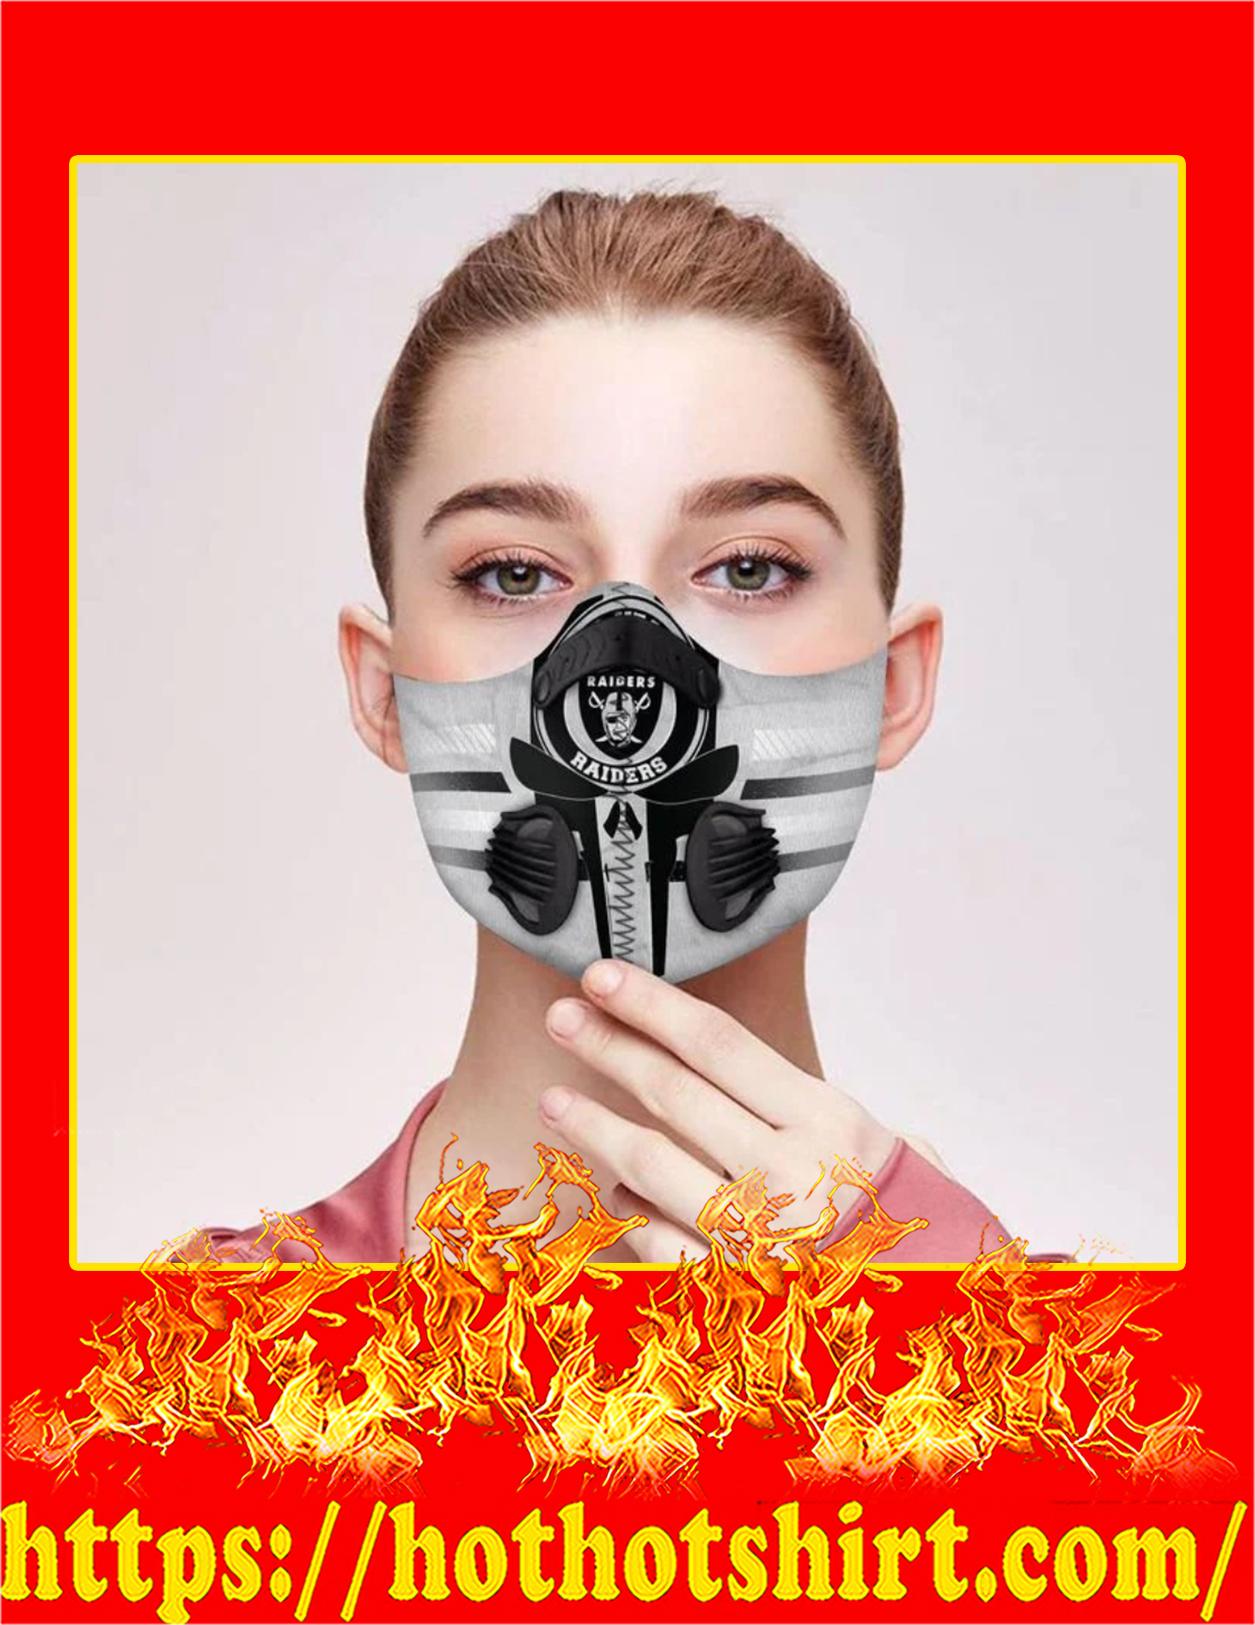 Raiders punisher skull filter face mask - Pic 1